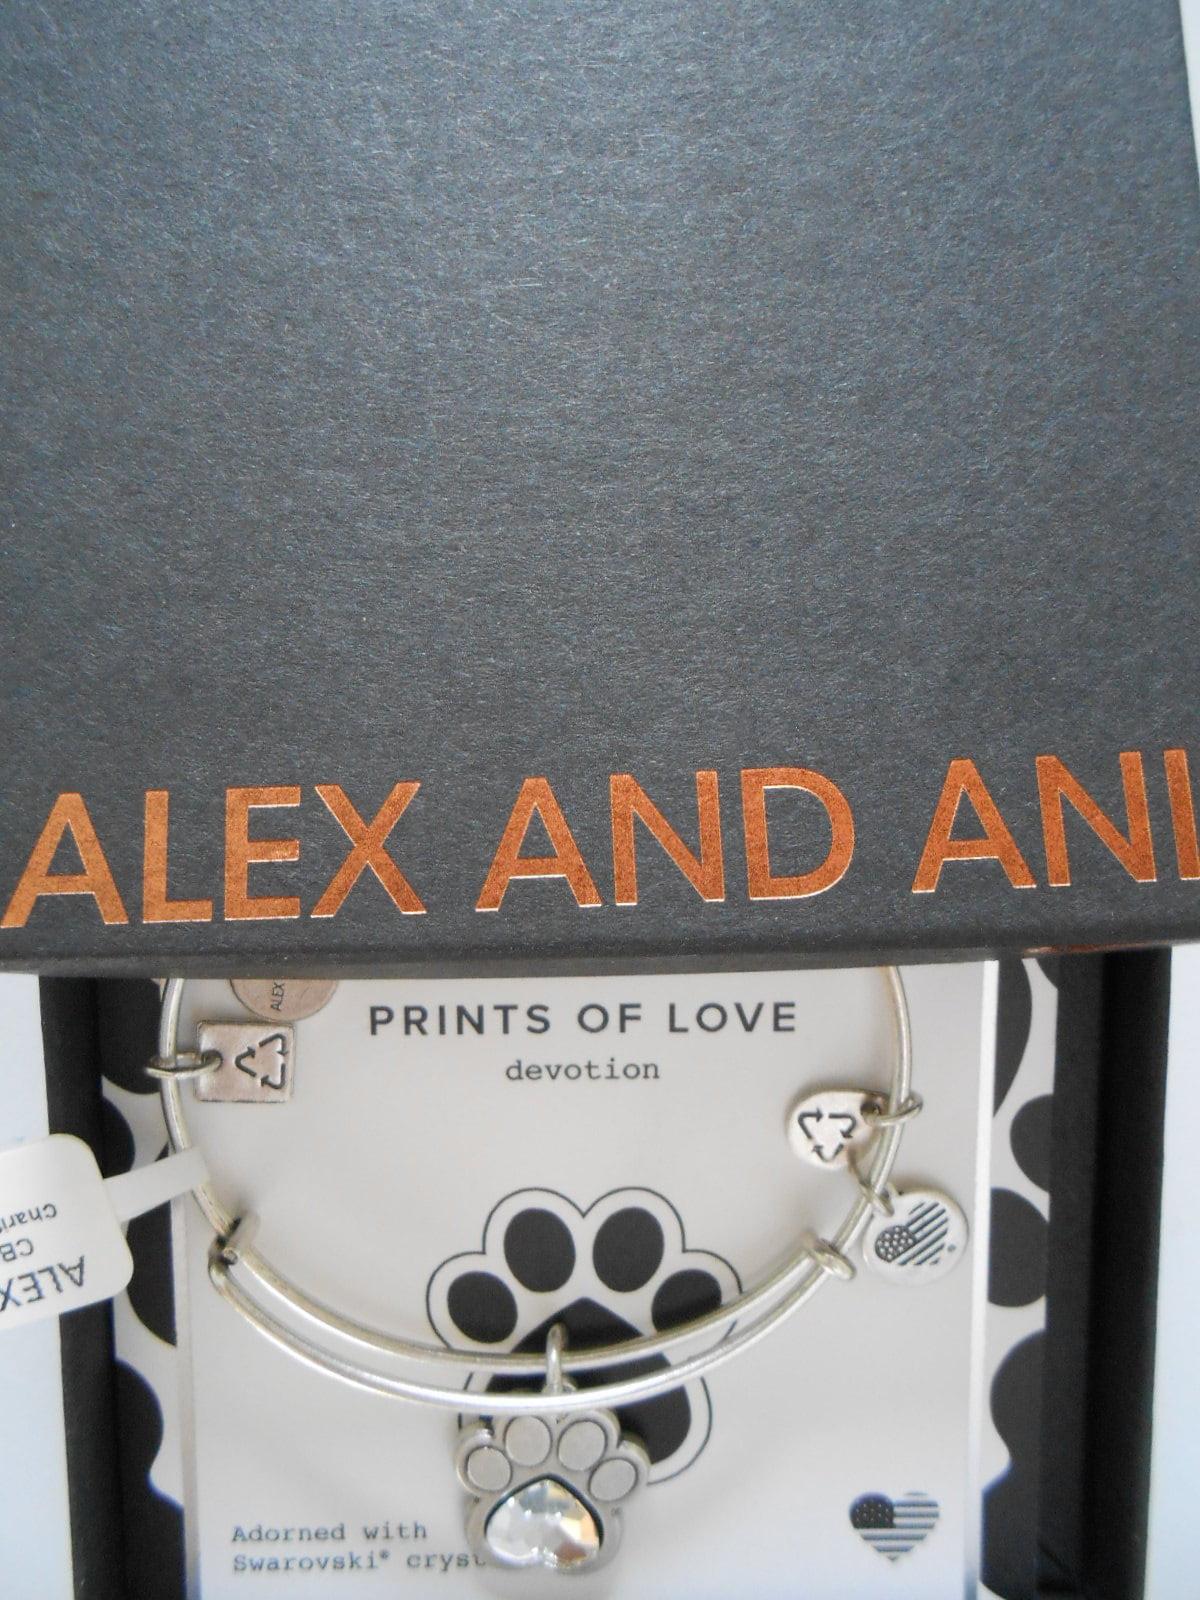 Alex and Ani Charity By Design, Prints of Love EWB Bangle Bracelet